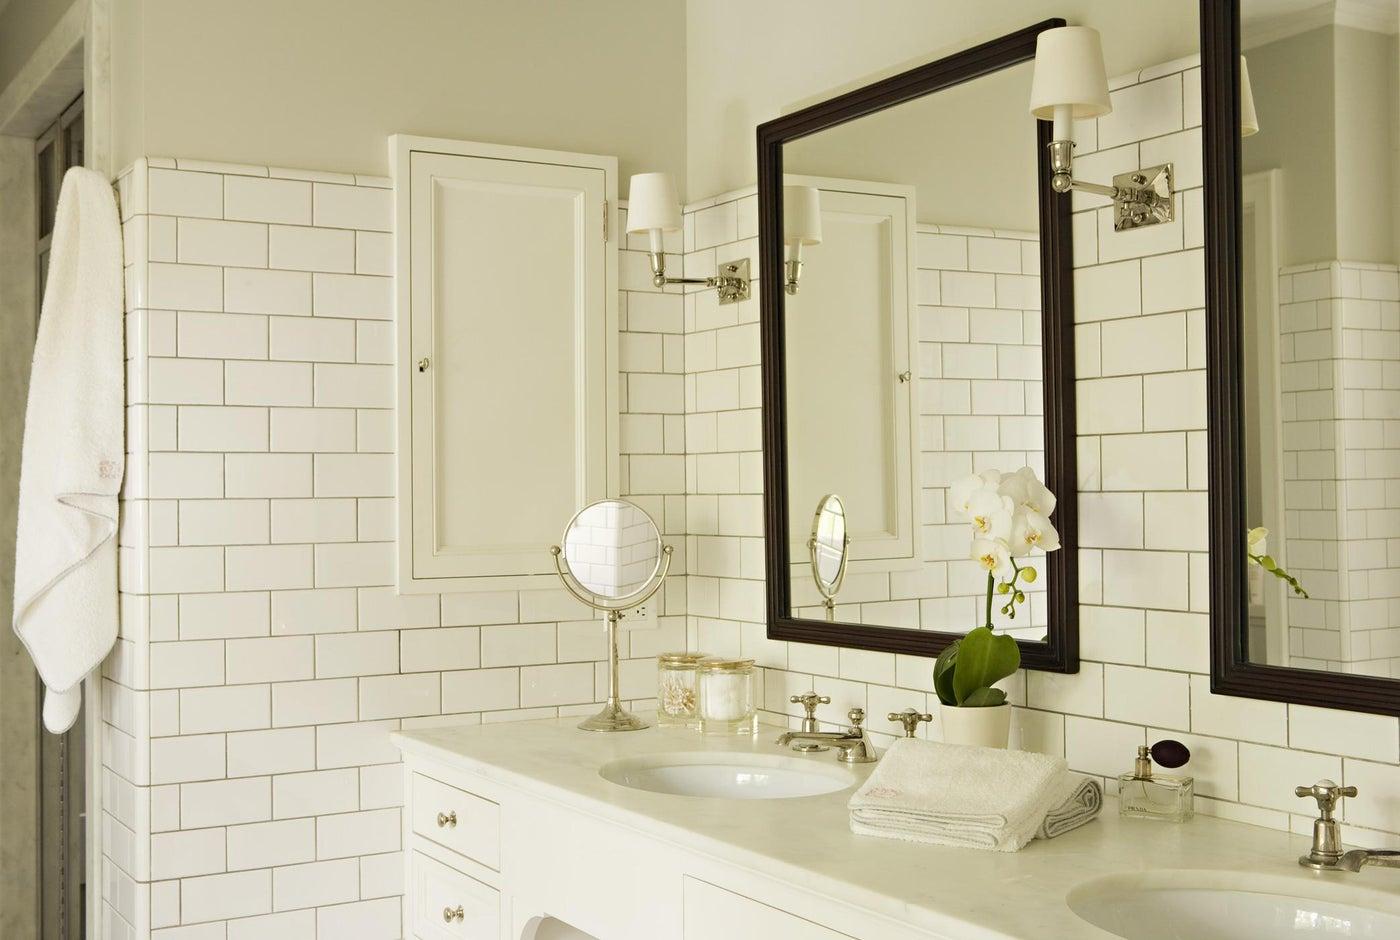 Master bathroom double vanity with subway tile backsplash and medicine cabinet